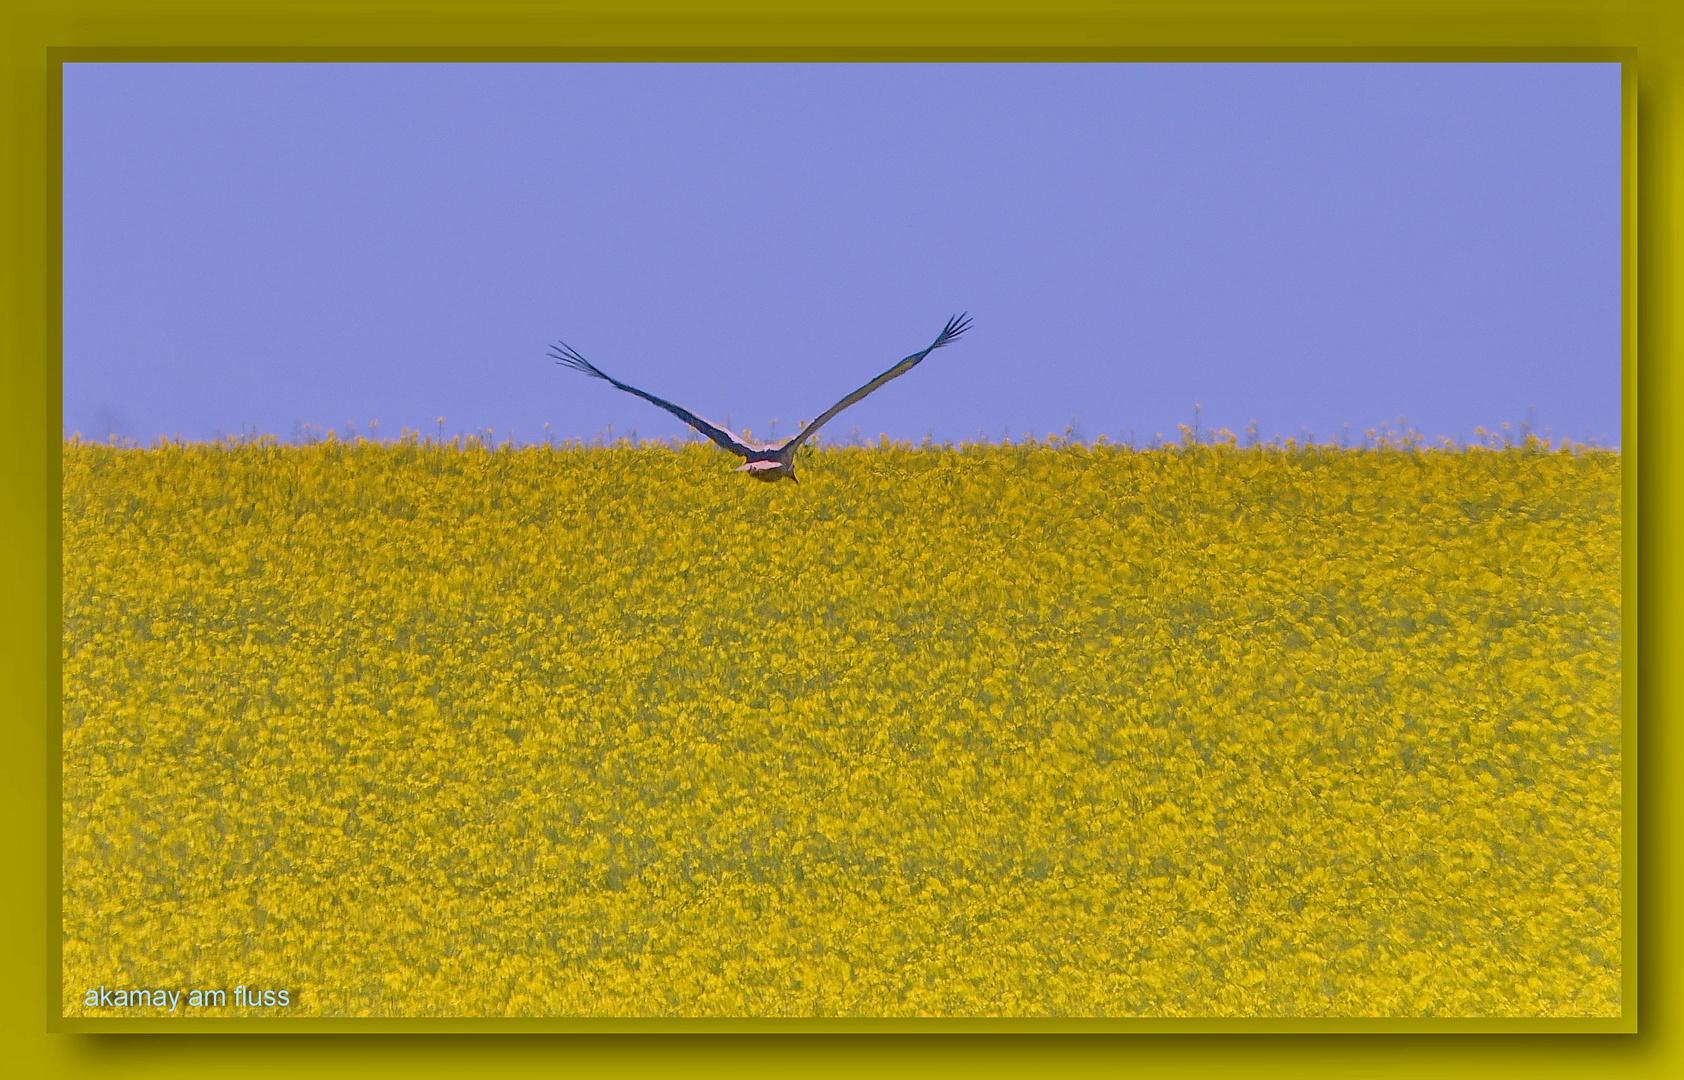 Storch - Flug über das Rapsfeld